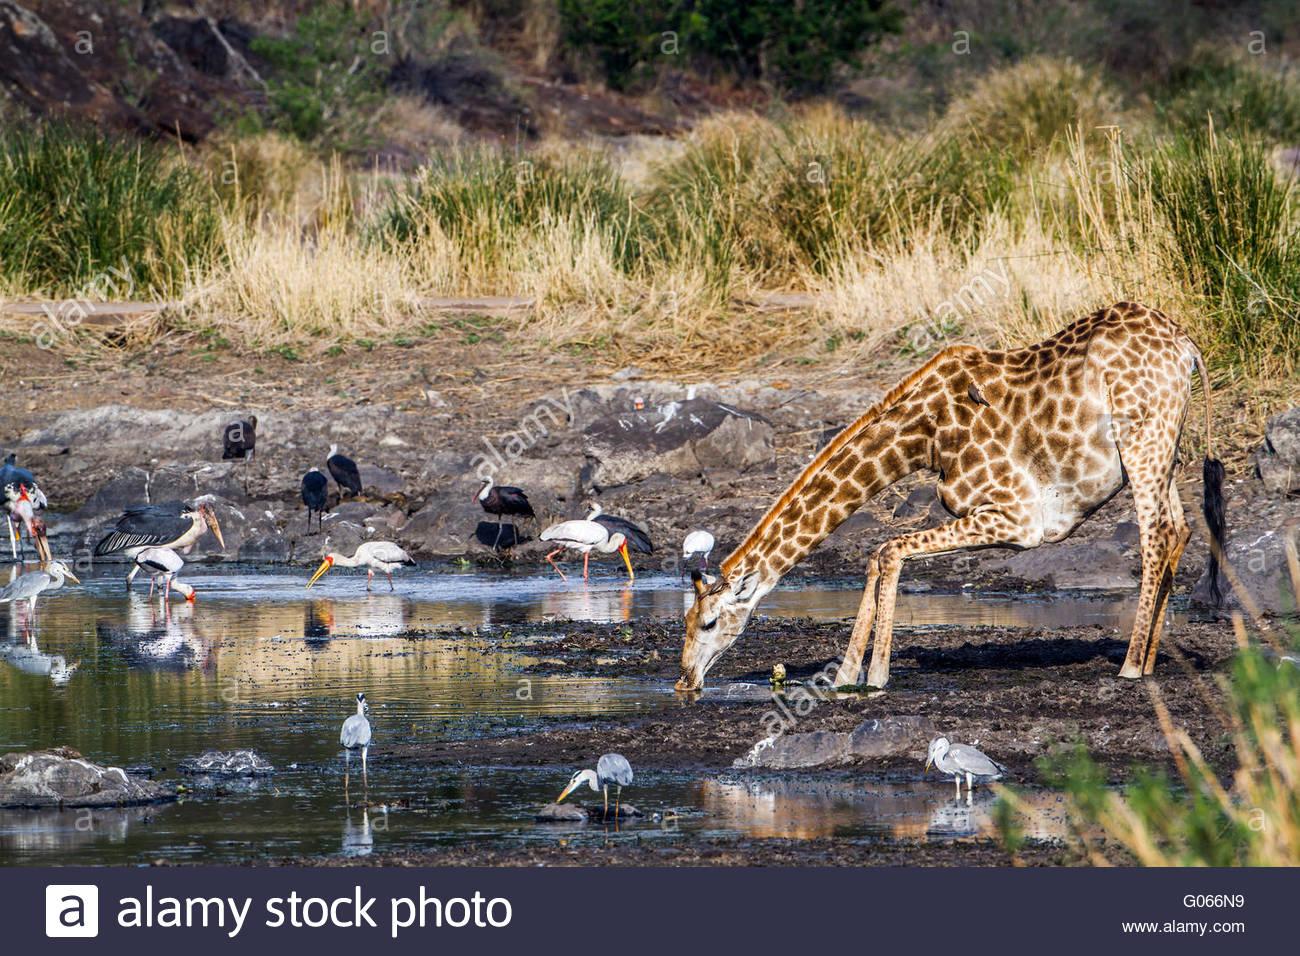 Giraffe in Kruger national park, South Africa ; Specie Giraffa camelopardalis family of Giraffidae - Stock Image